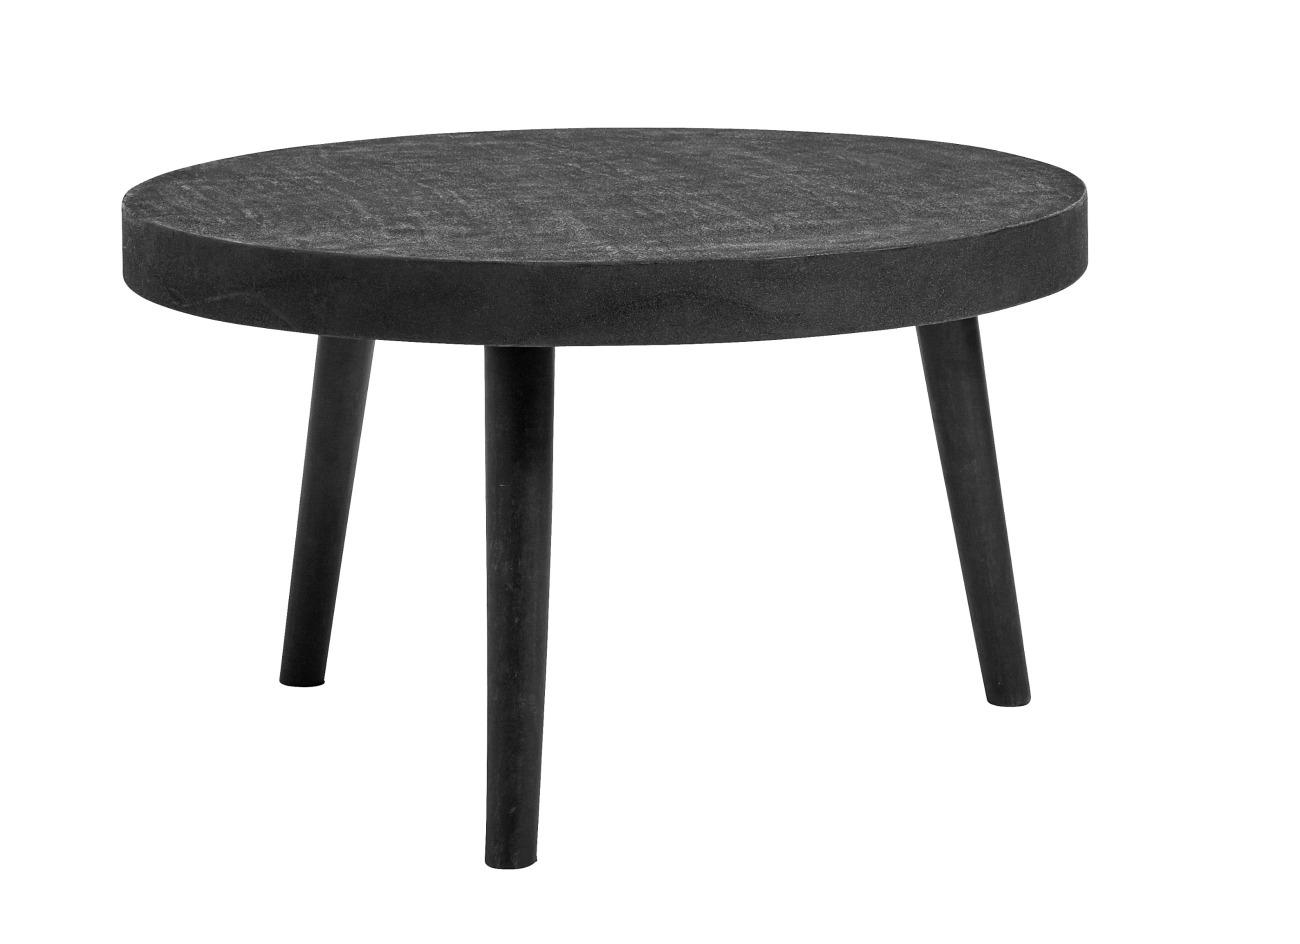 Soffbord - Svart betong/trä